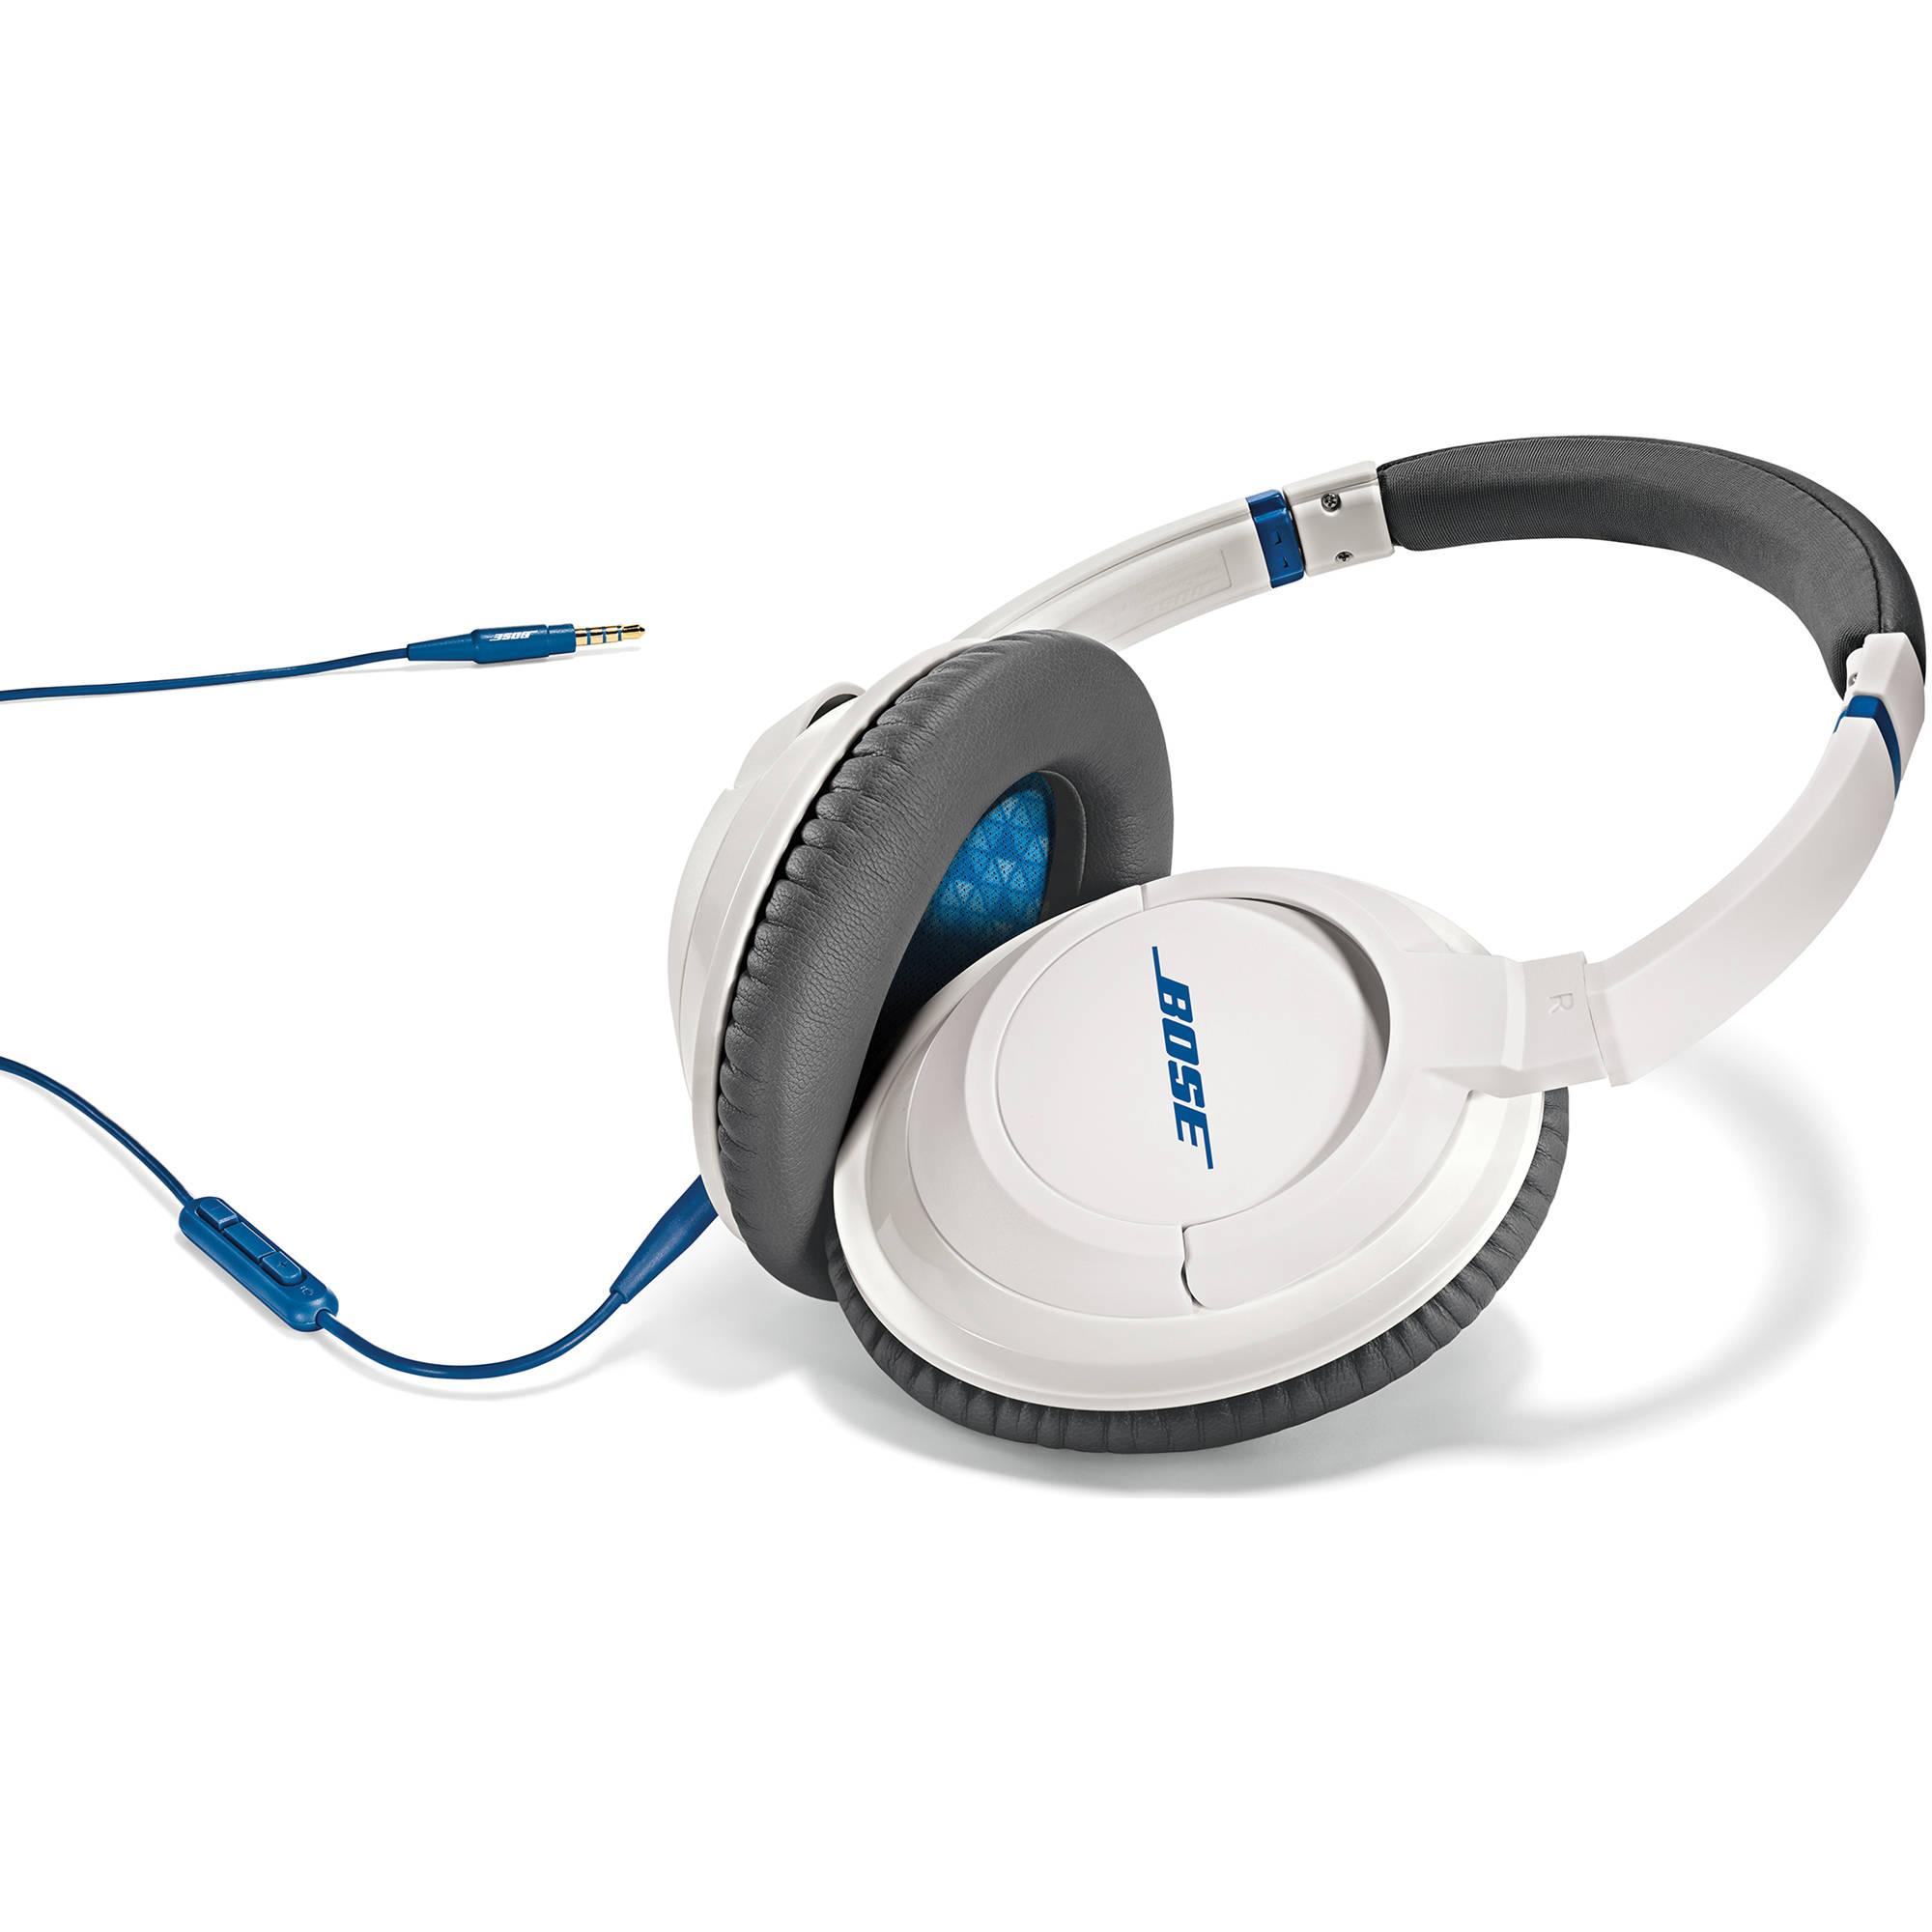 Bose Audio >> Bose SoundTrue Around-Ear Headphones (White) 626238-0020 B&H